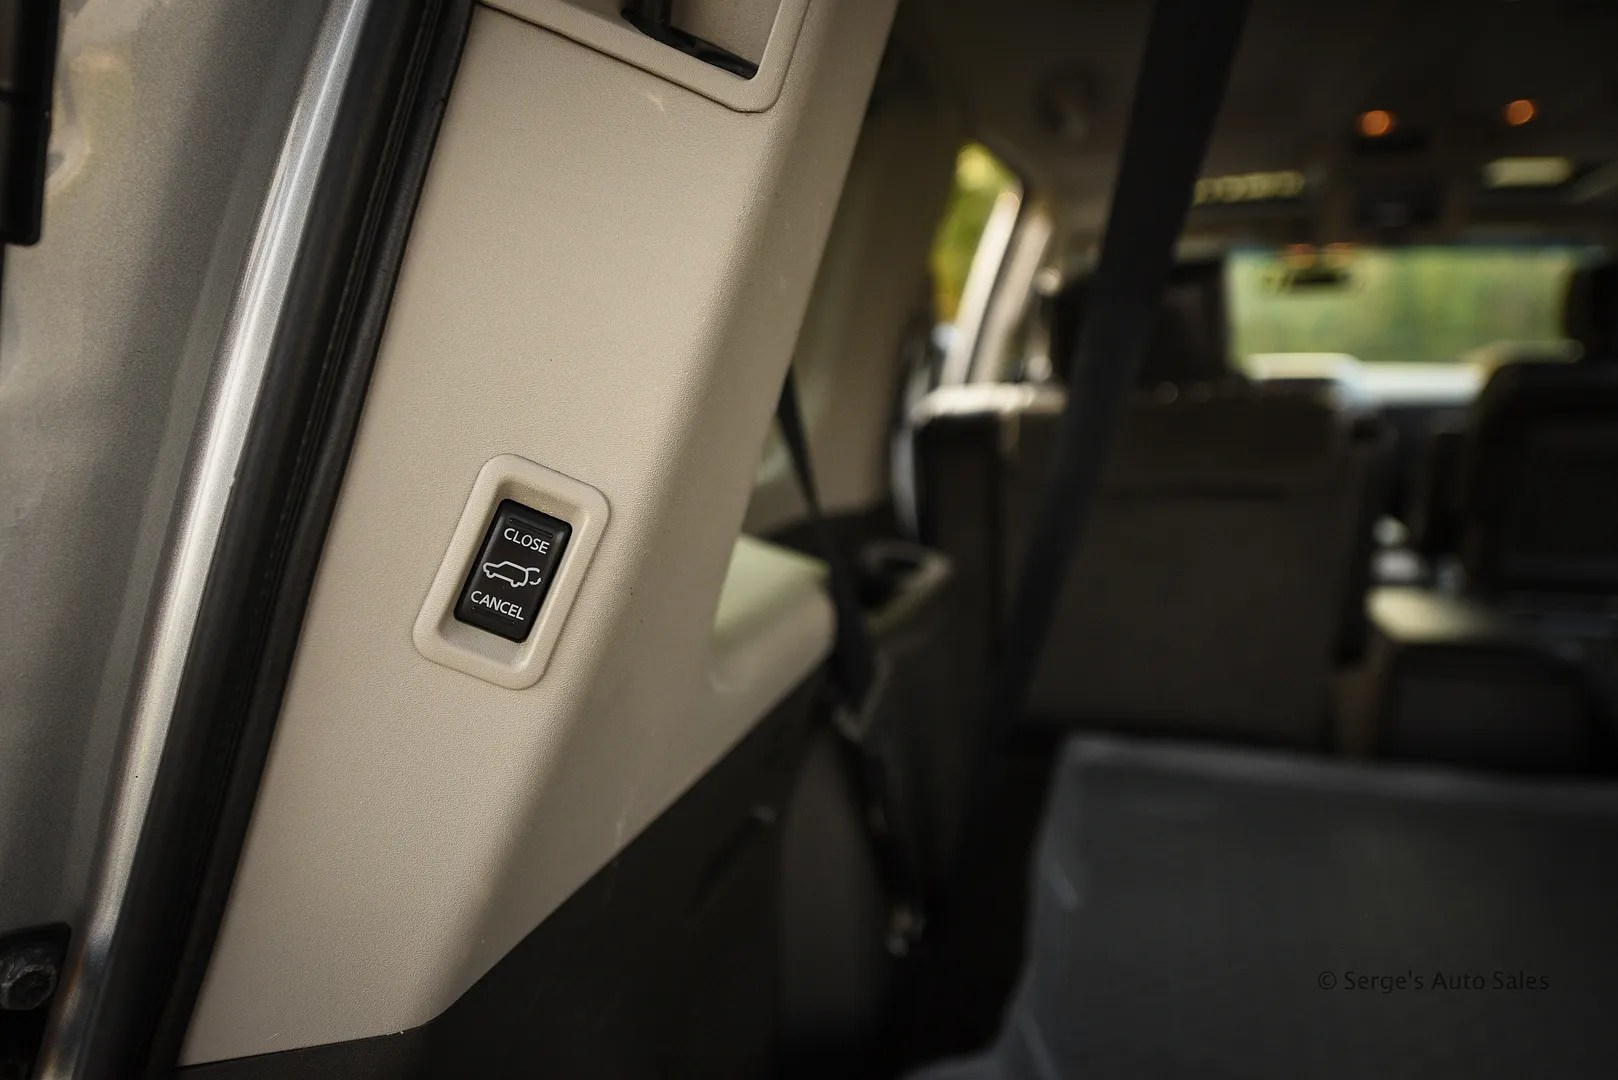 photo Infiniti-Serges-Auto-Sales-Car-dealer-Pennsylvania-QX56-Scranton-Nepa-64_zpszzx6jk9a.jpg